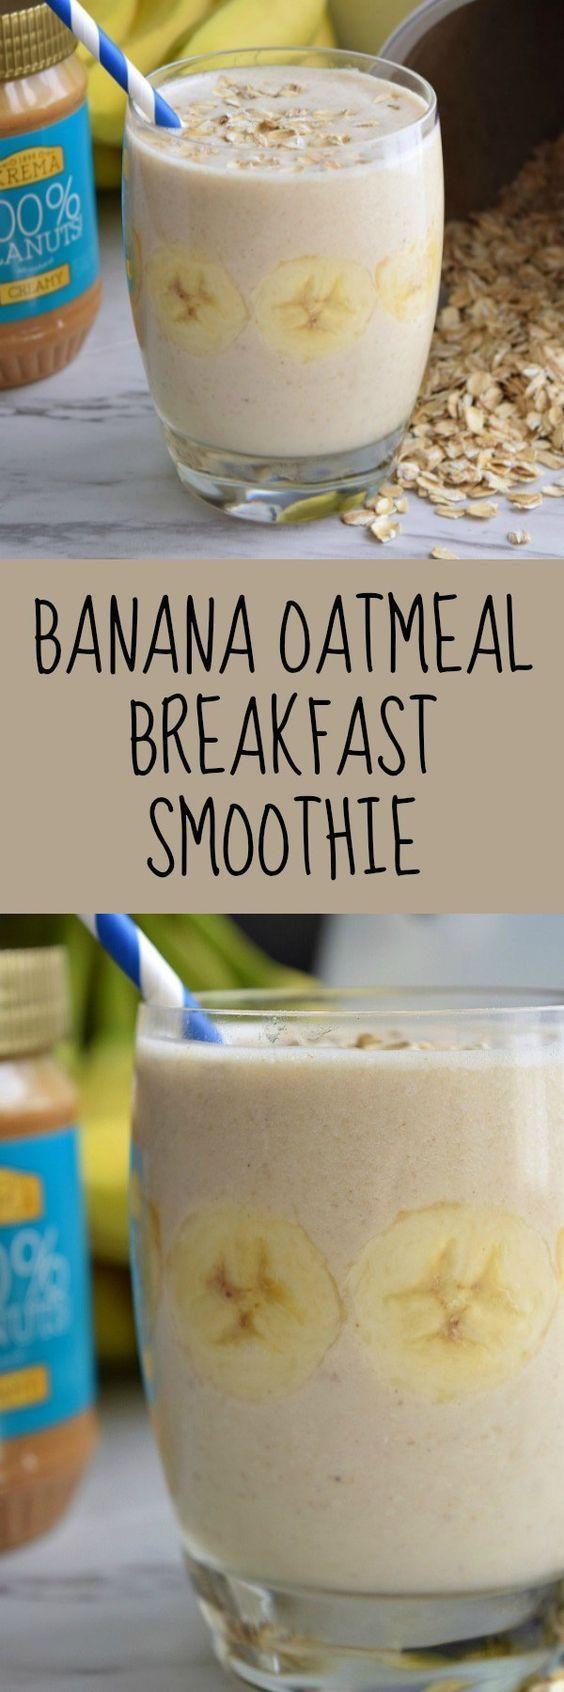 Diabetic Smoothies With Almond Milk  Banana Oatmeal Breakfast Smoothie